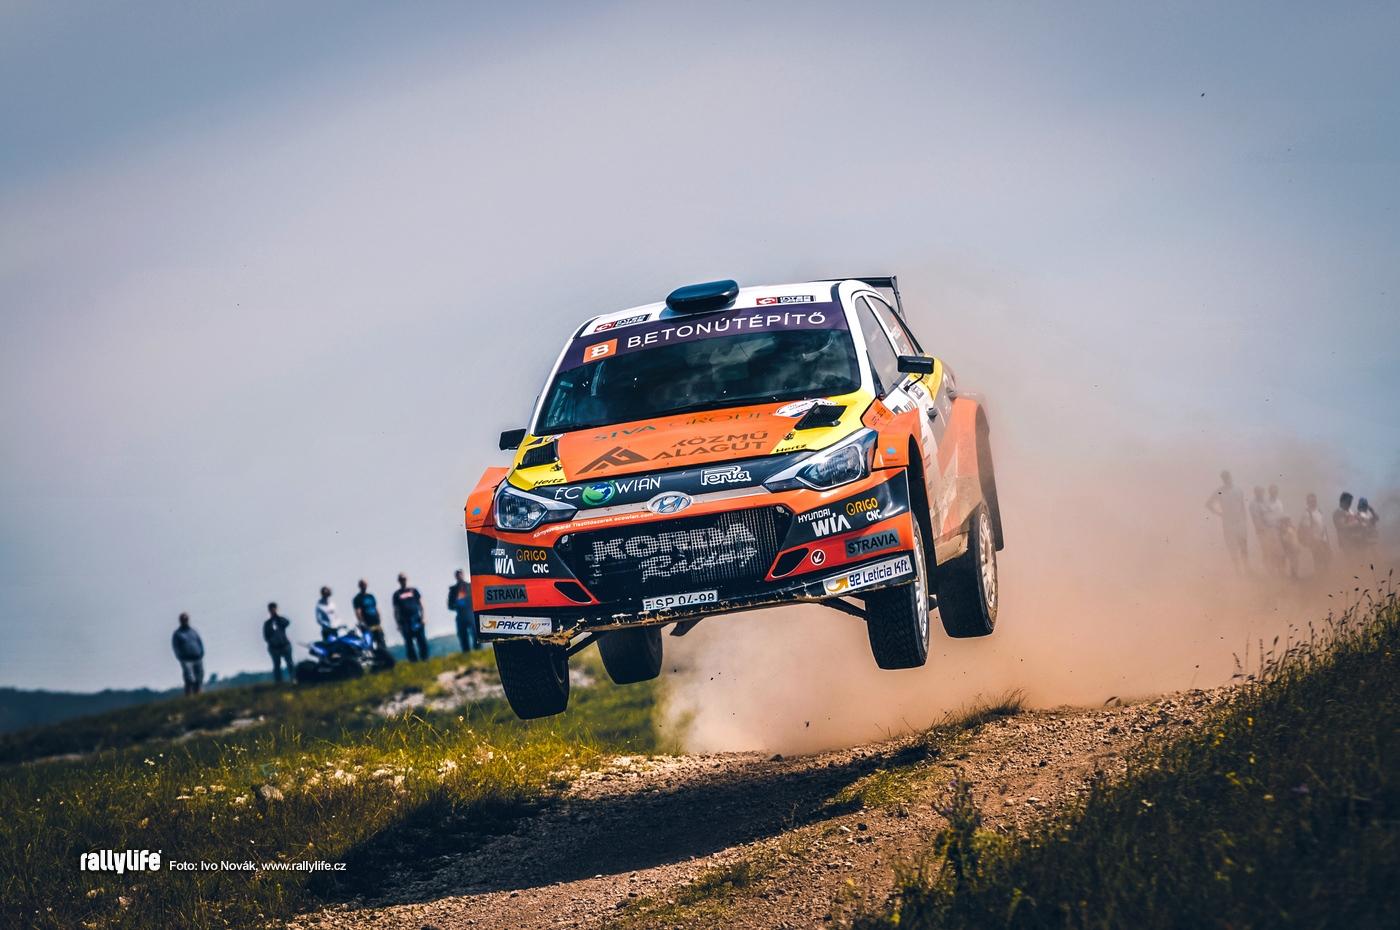 Veszprém rallye 2018